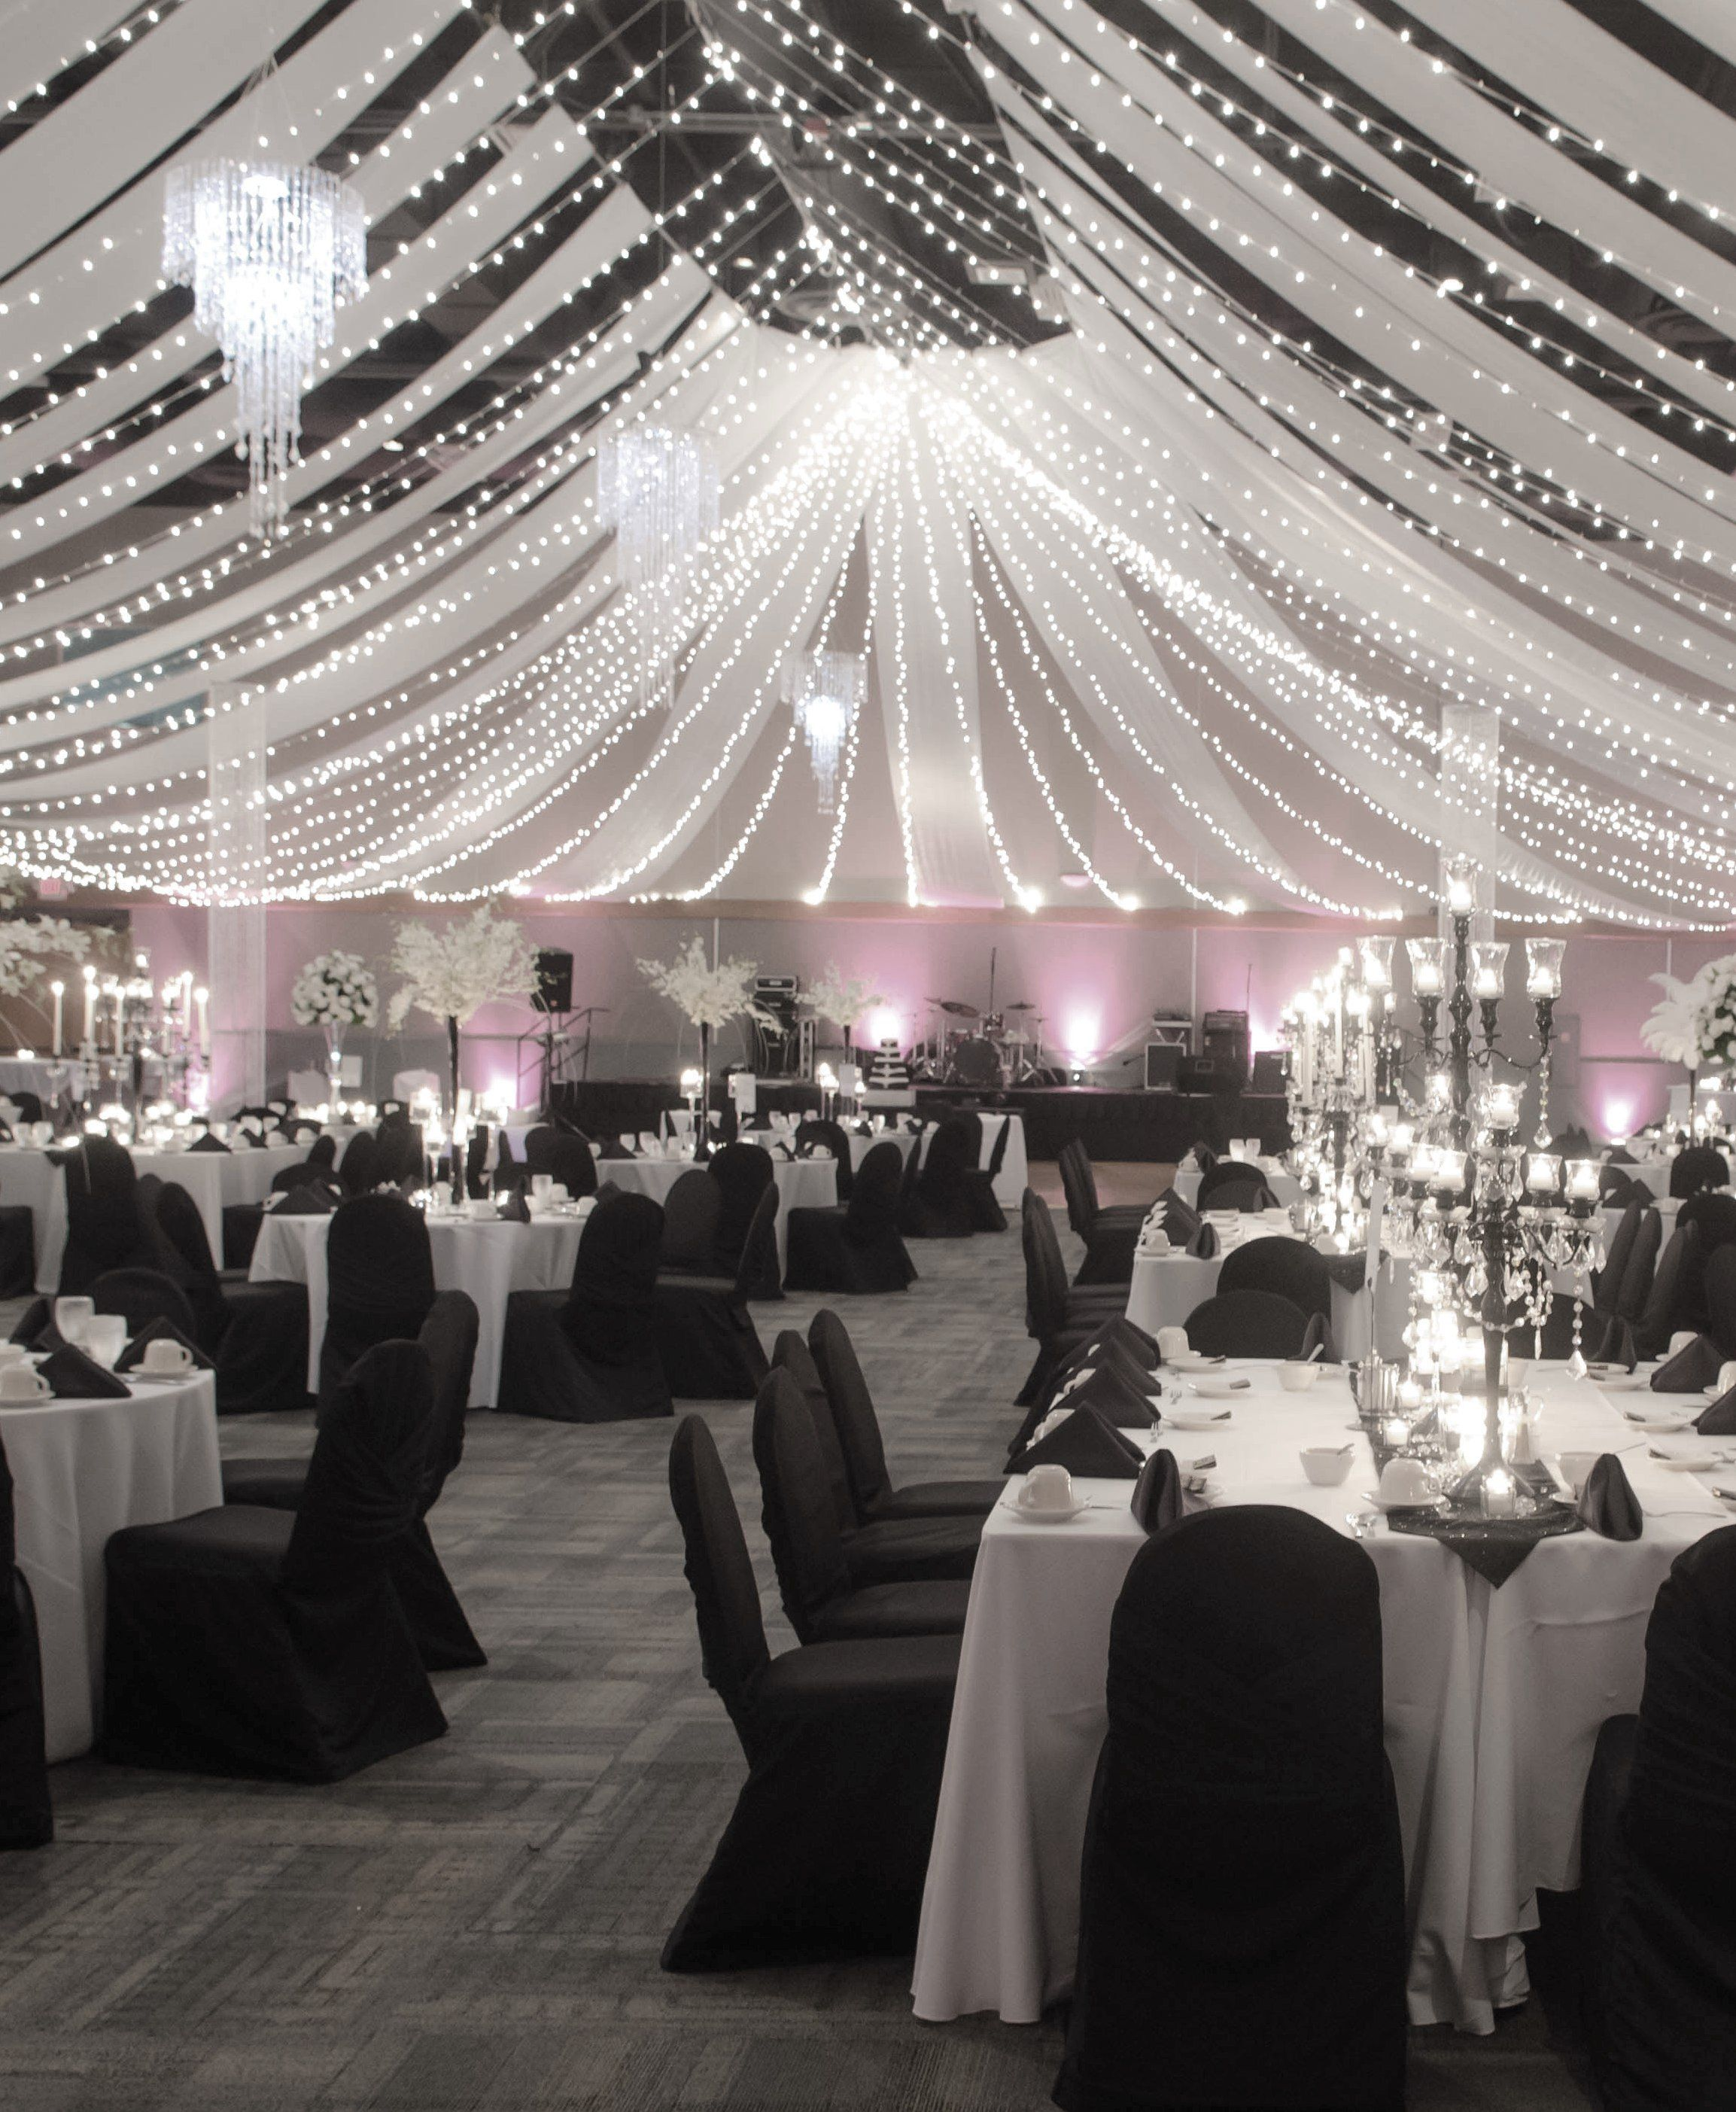 Wedding Venues The Rivercenter Davenport Iowa Myiowawedding